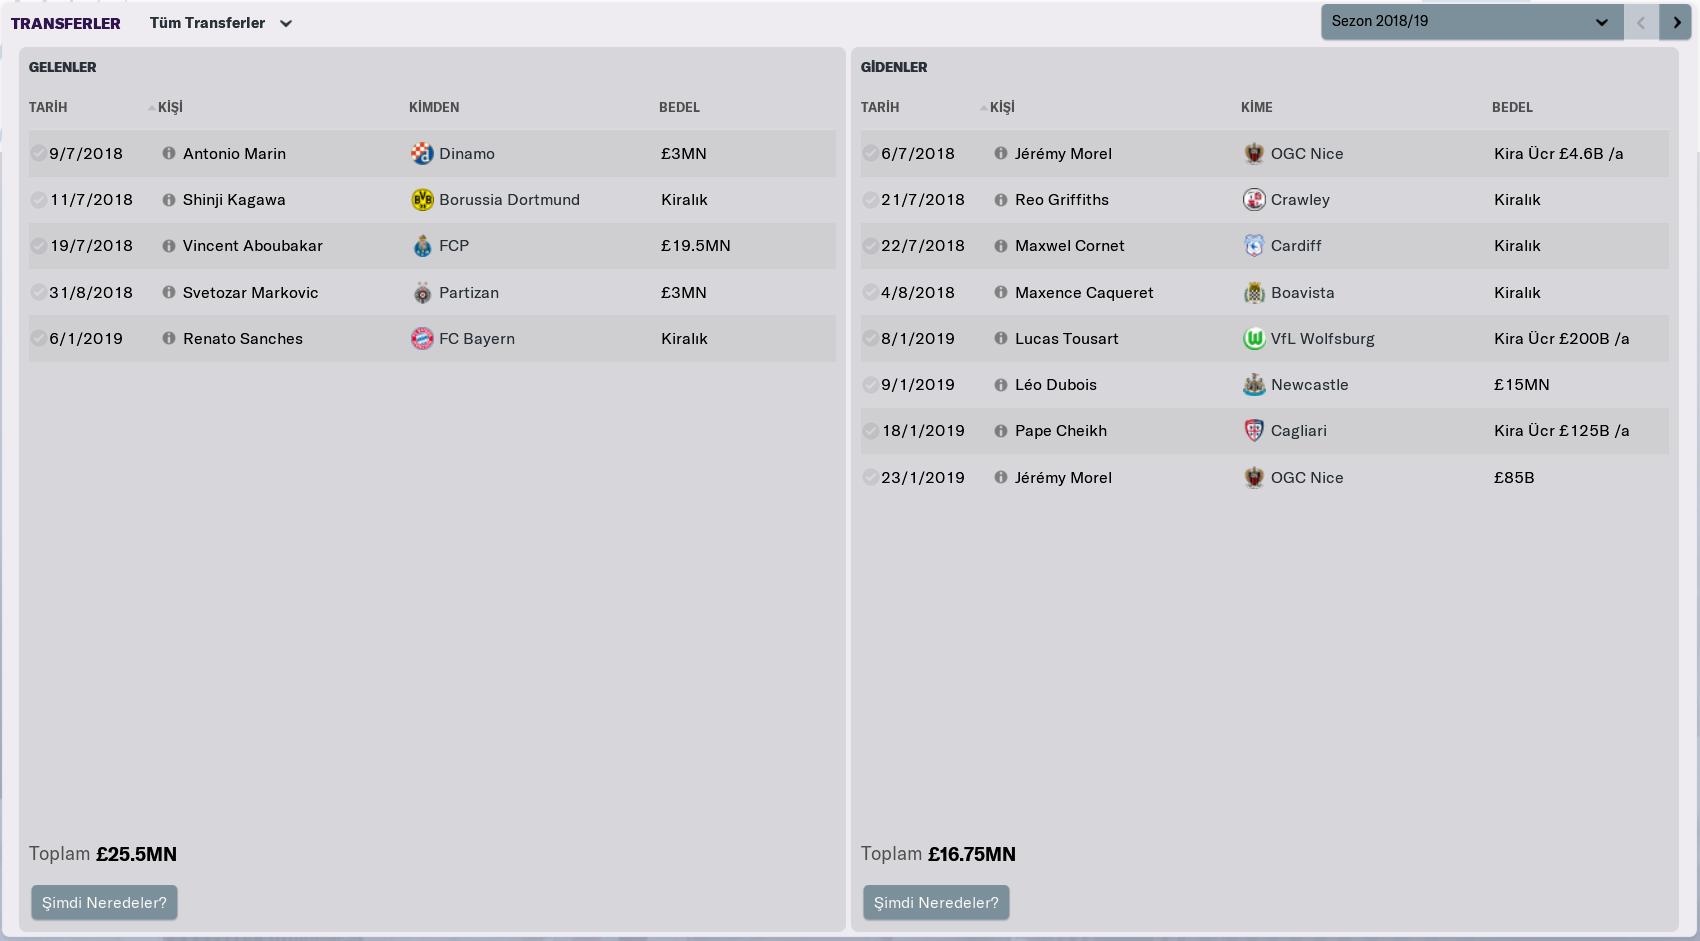 1.sezon Transferler